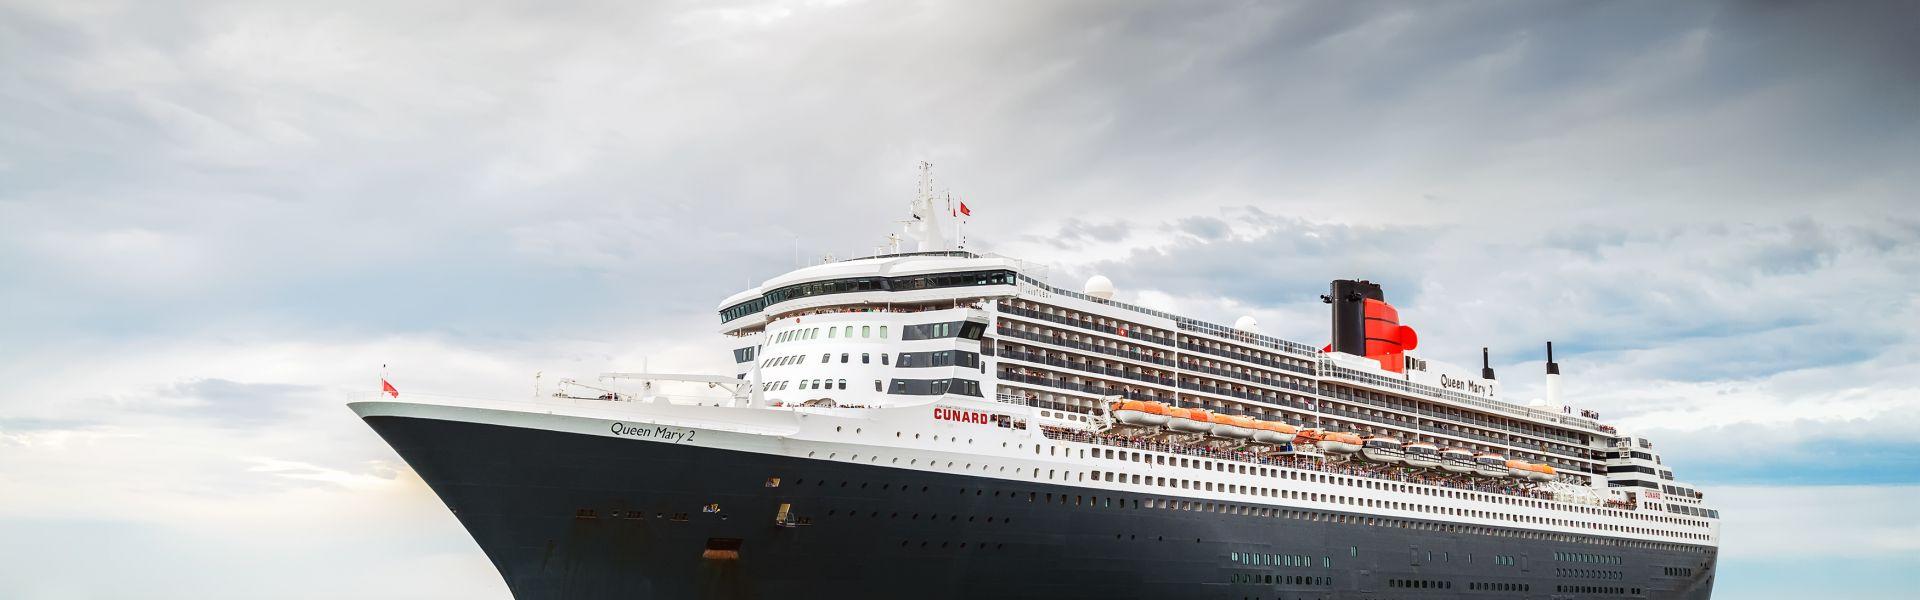 Croaziera 2019 - World & Exotic (Shanghai) - Cunard Line - Queen Mary 2 - 50 nopti